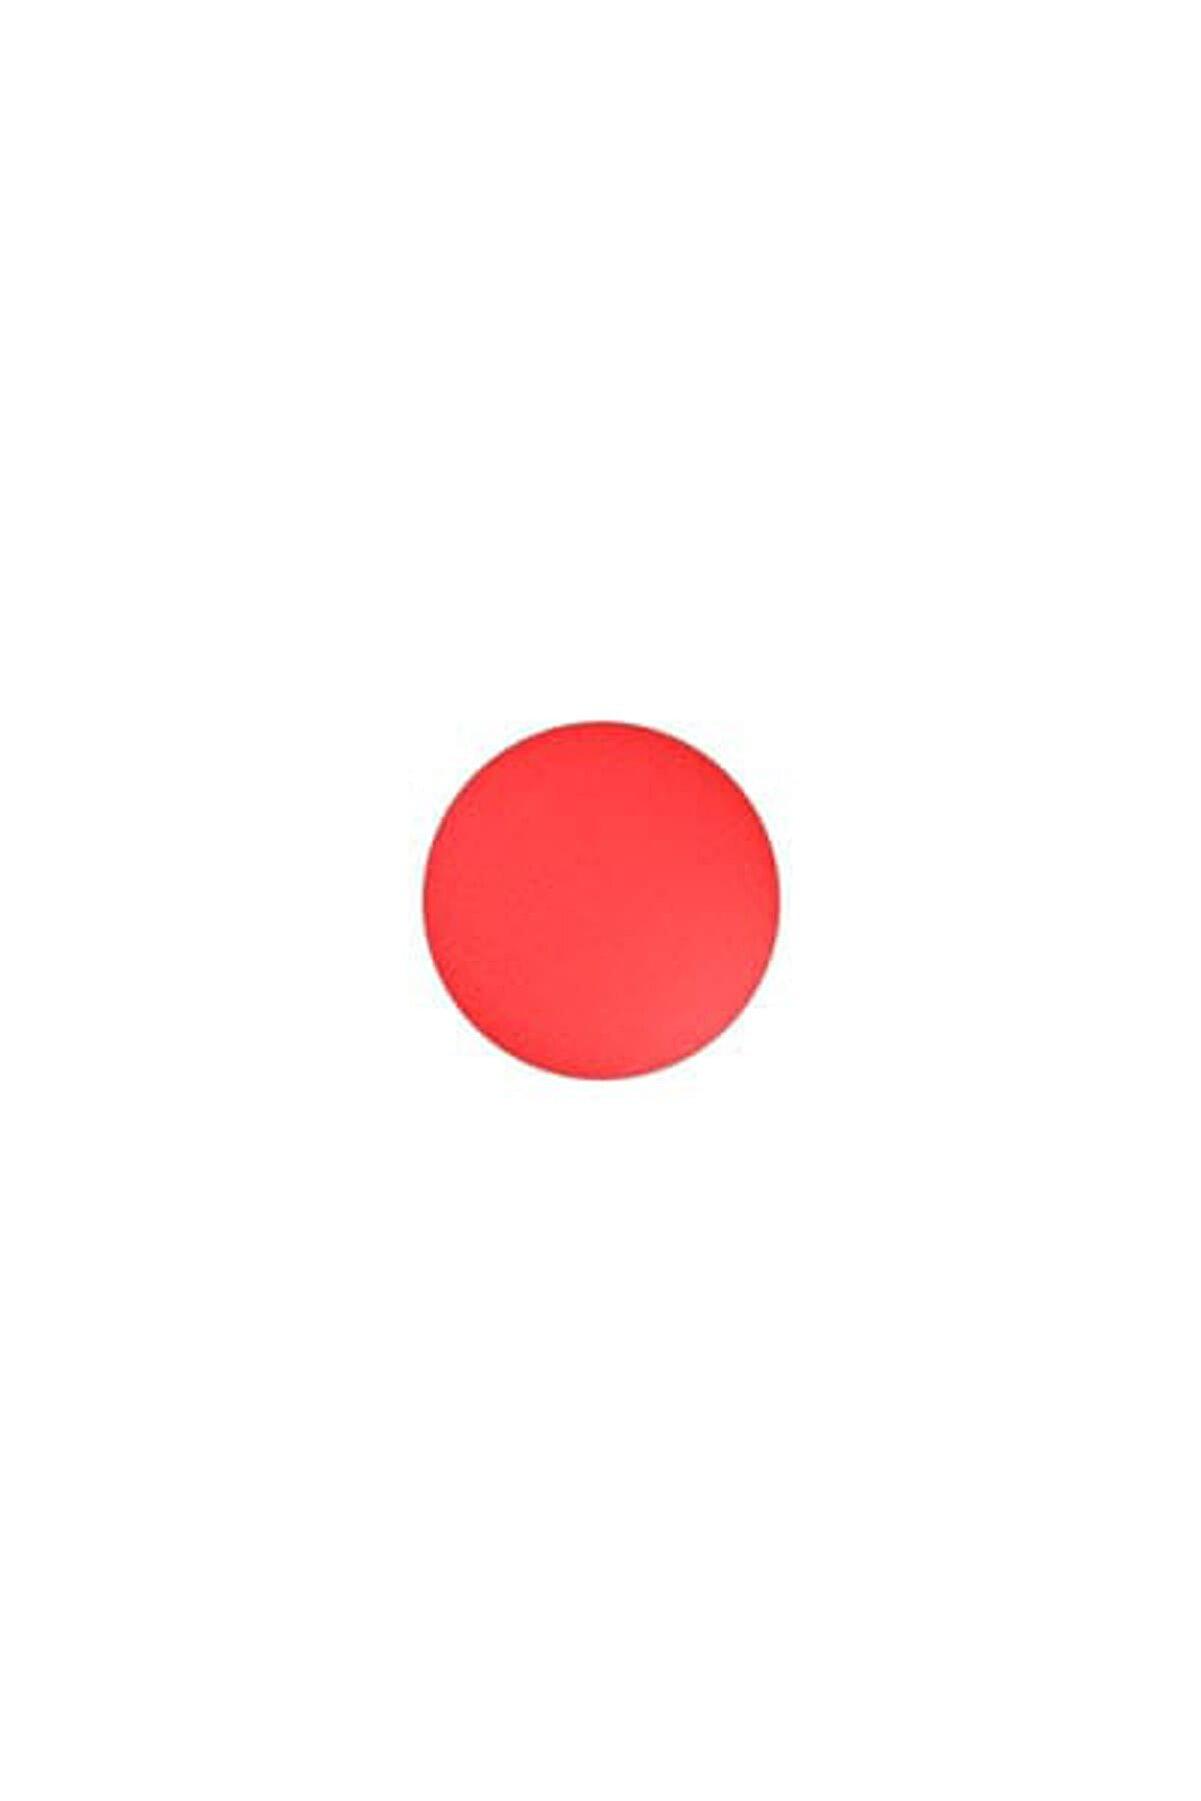 Mac Refill Allık - Powder Blush Pro Palette Refill Pan News Flash! 1.3 g 773602463152